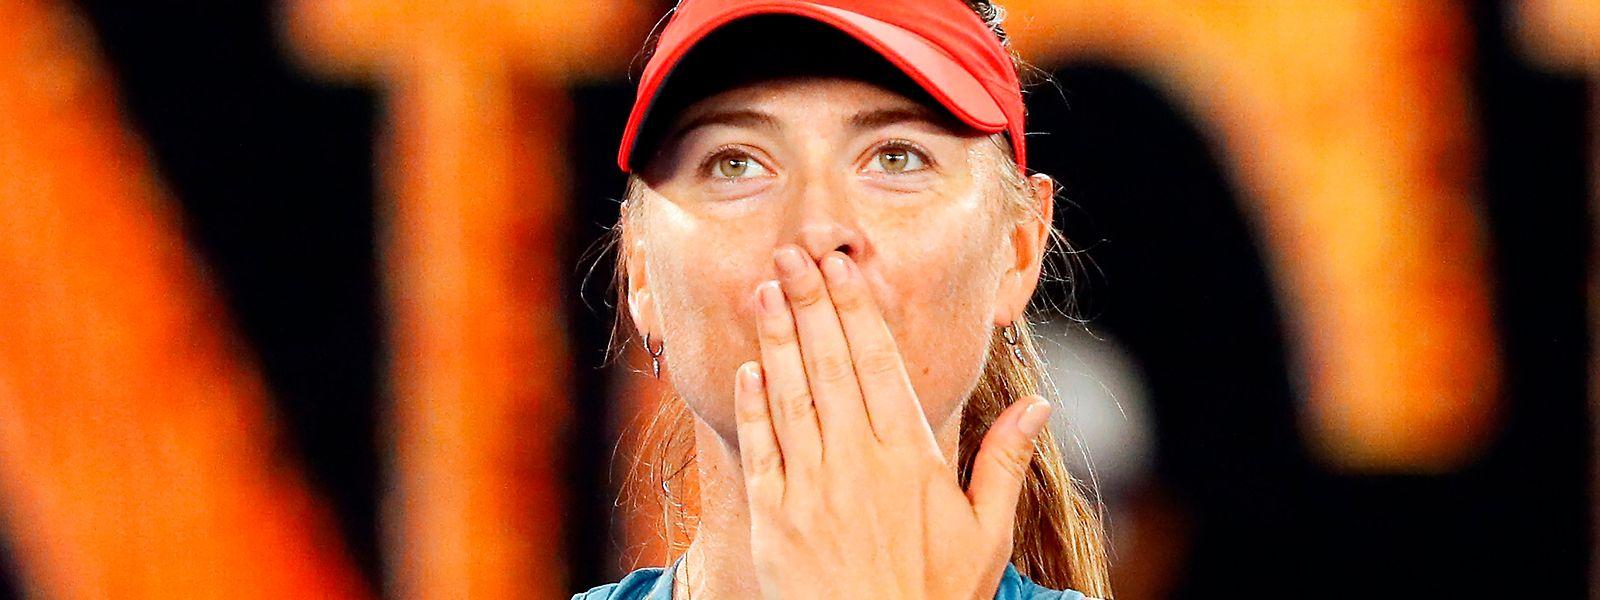 La Russe Maria Sharapova a éjecté la tenante du titre à Melbourne, la Danoise Caroline Wozniacki